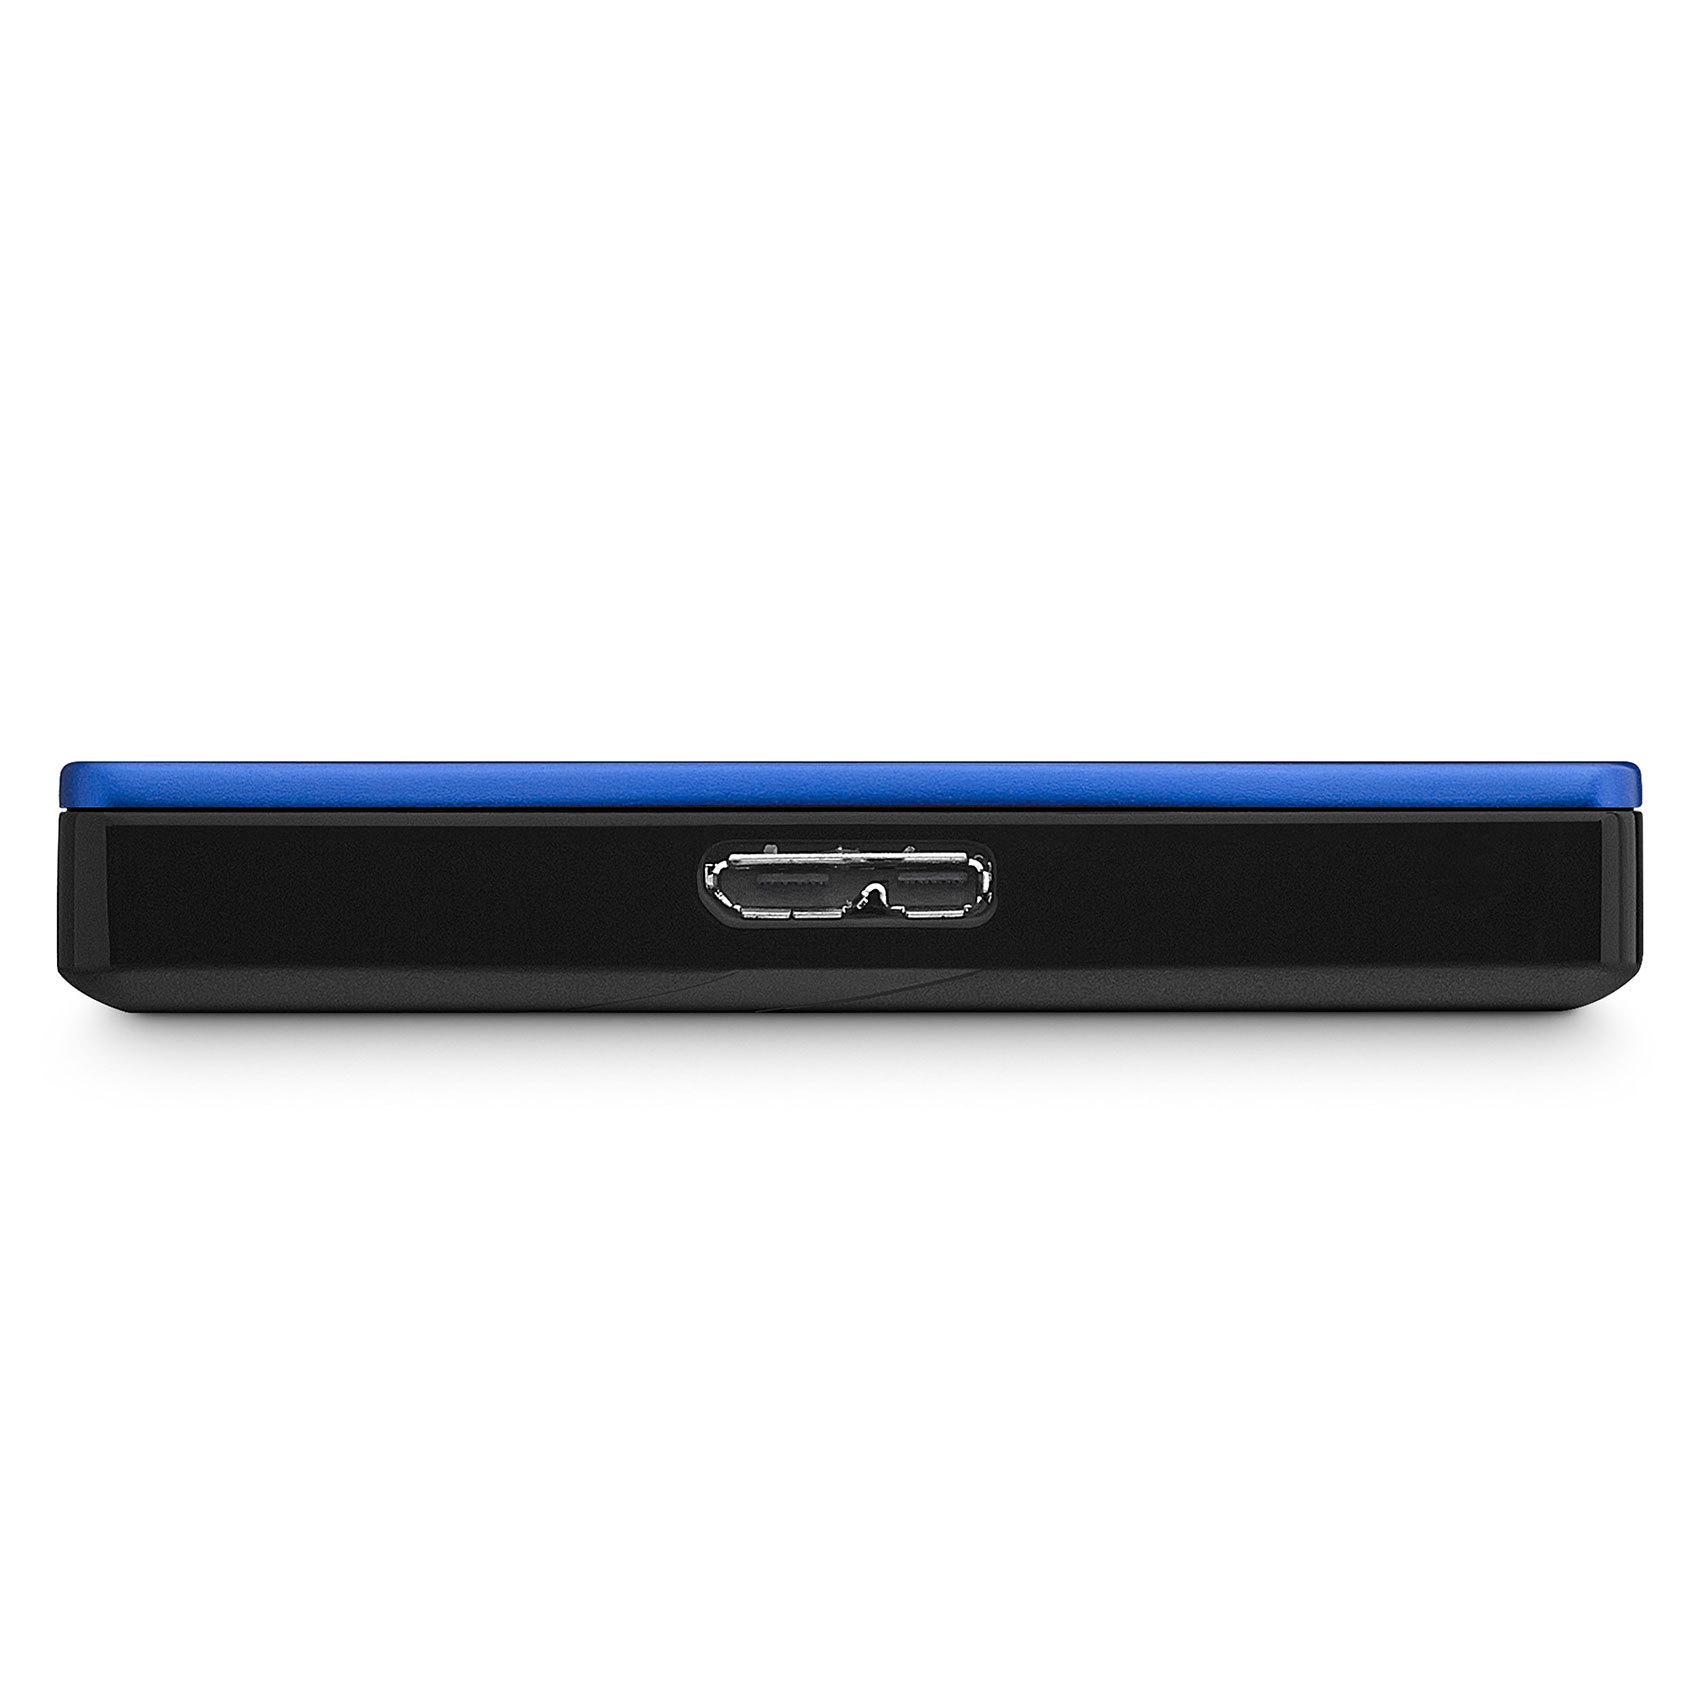 SEAGATE HDD 1TB BKUP+ PORT SLIM BL